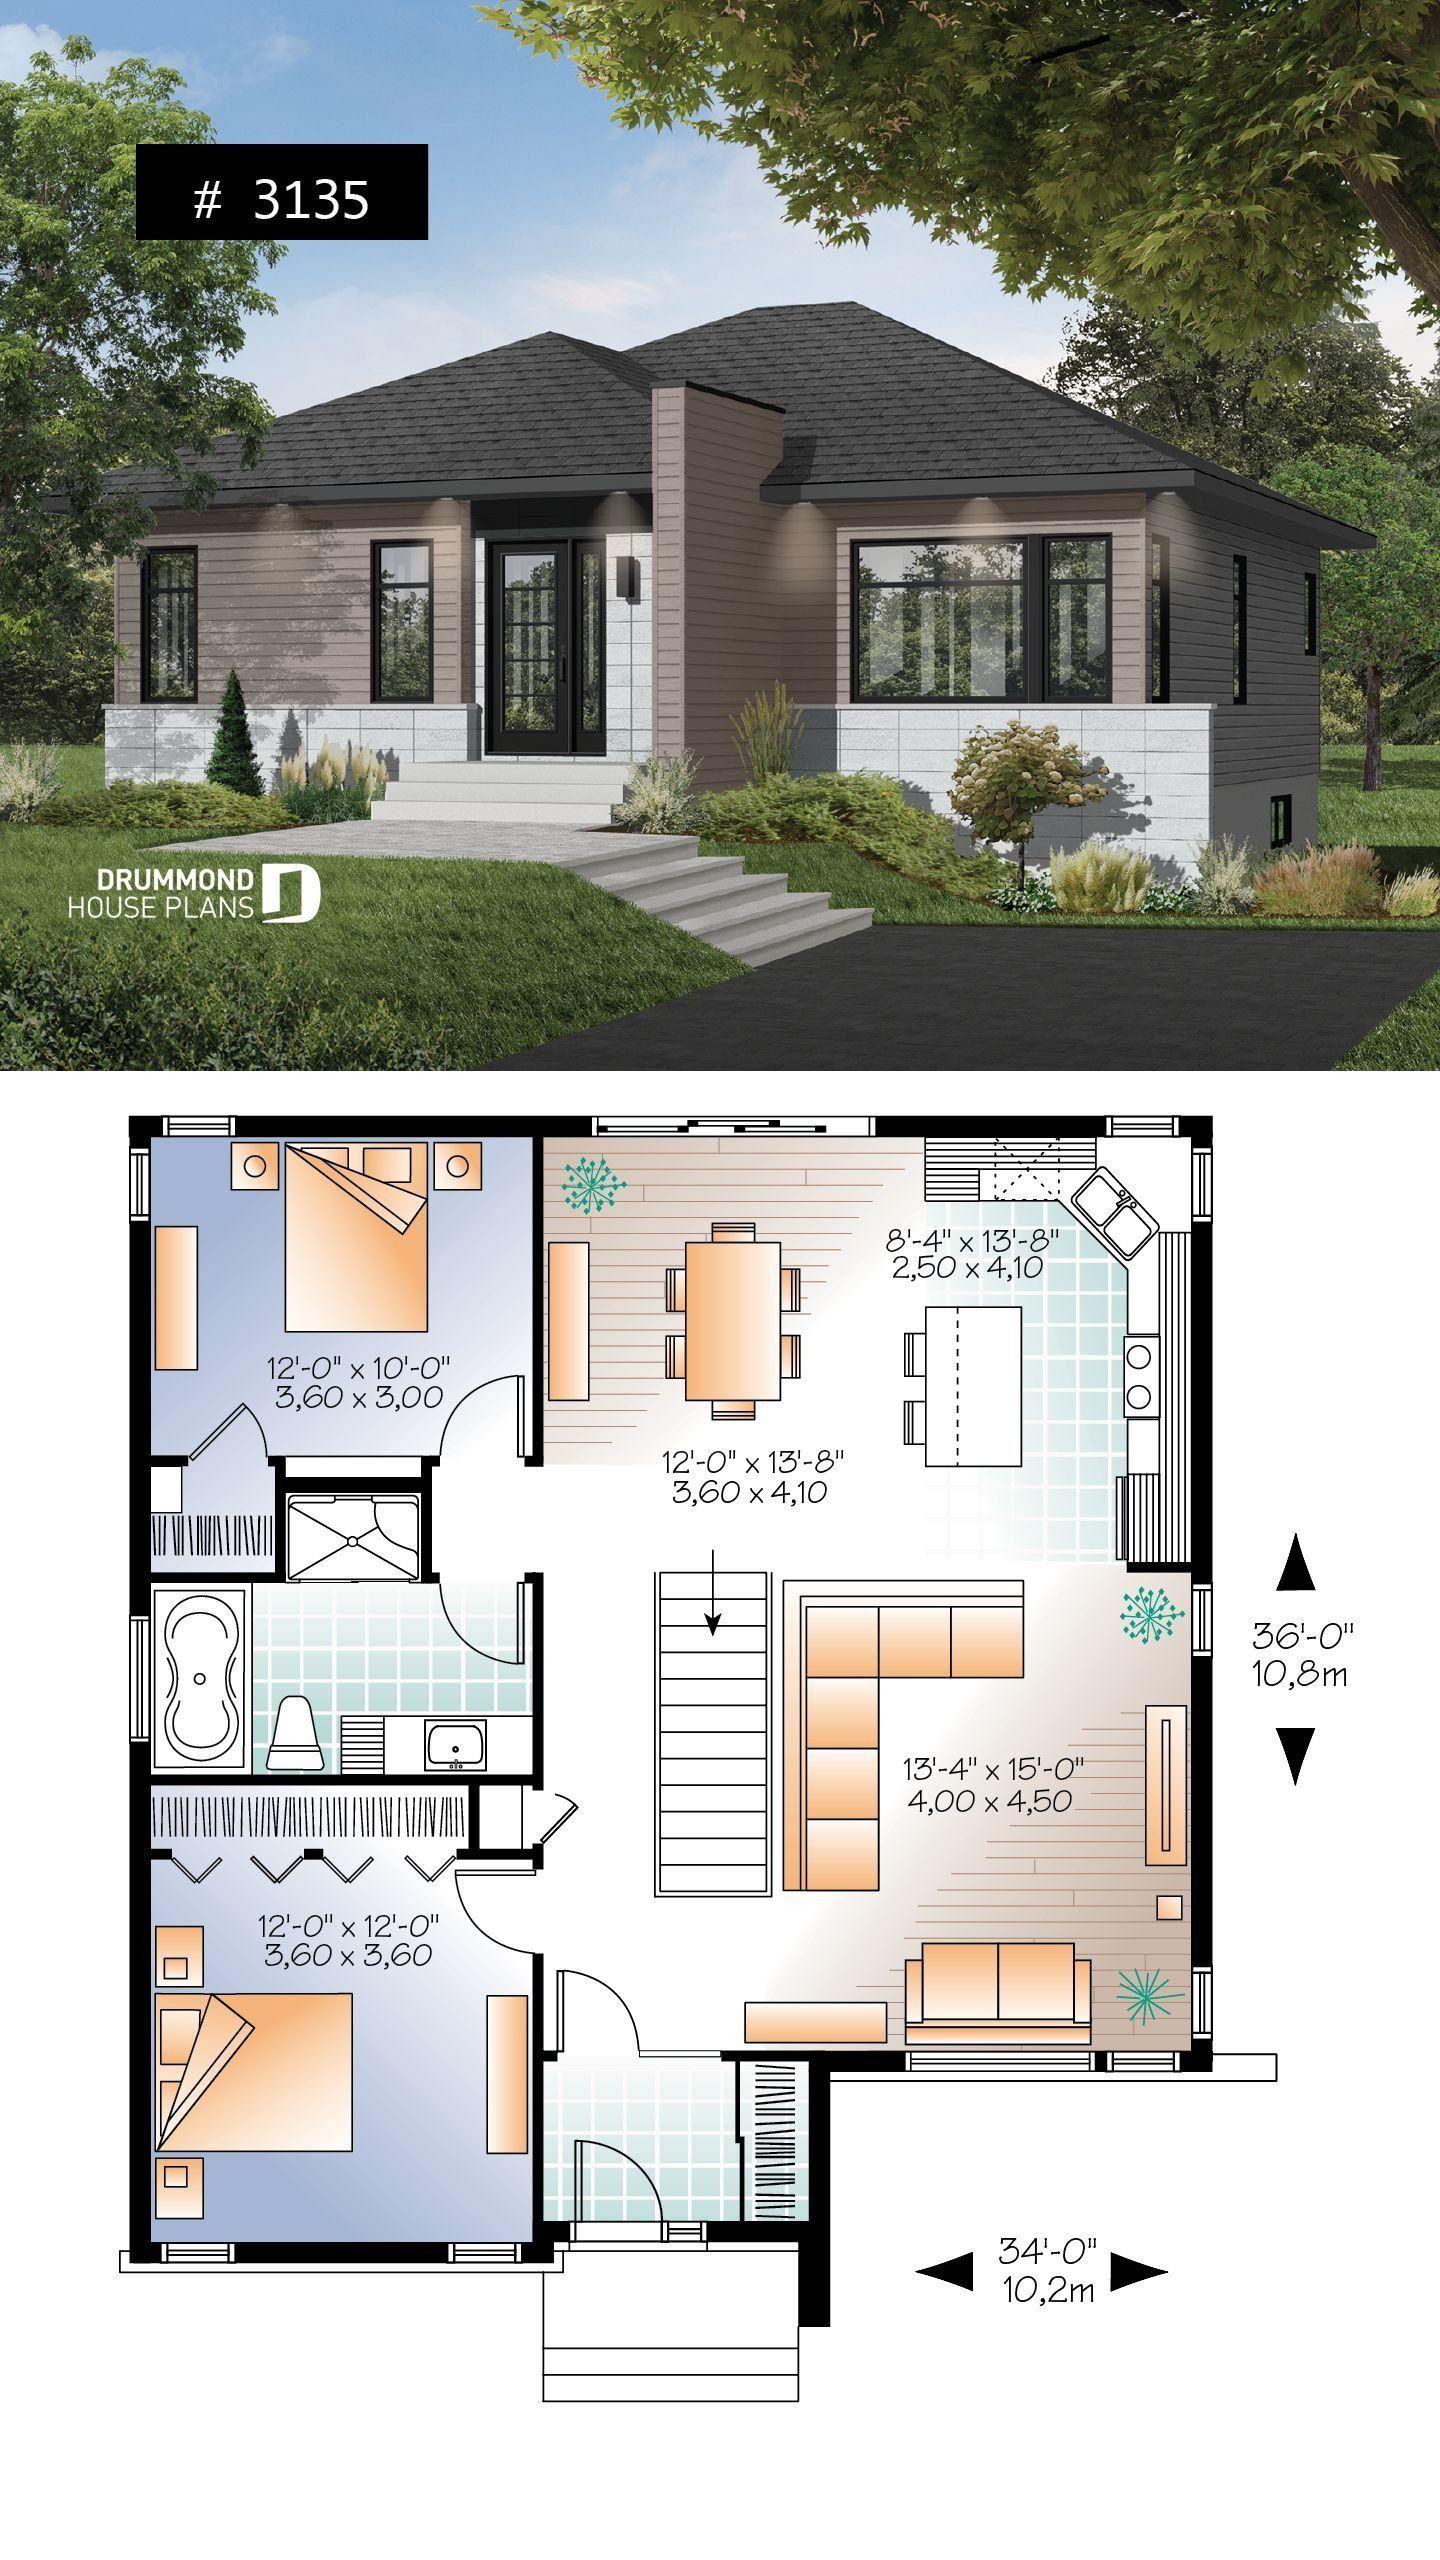 Open Plan Bungalow Simon Beale Associates Irish House Plans House Designs Ireland Cottage Style House Plans